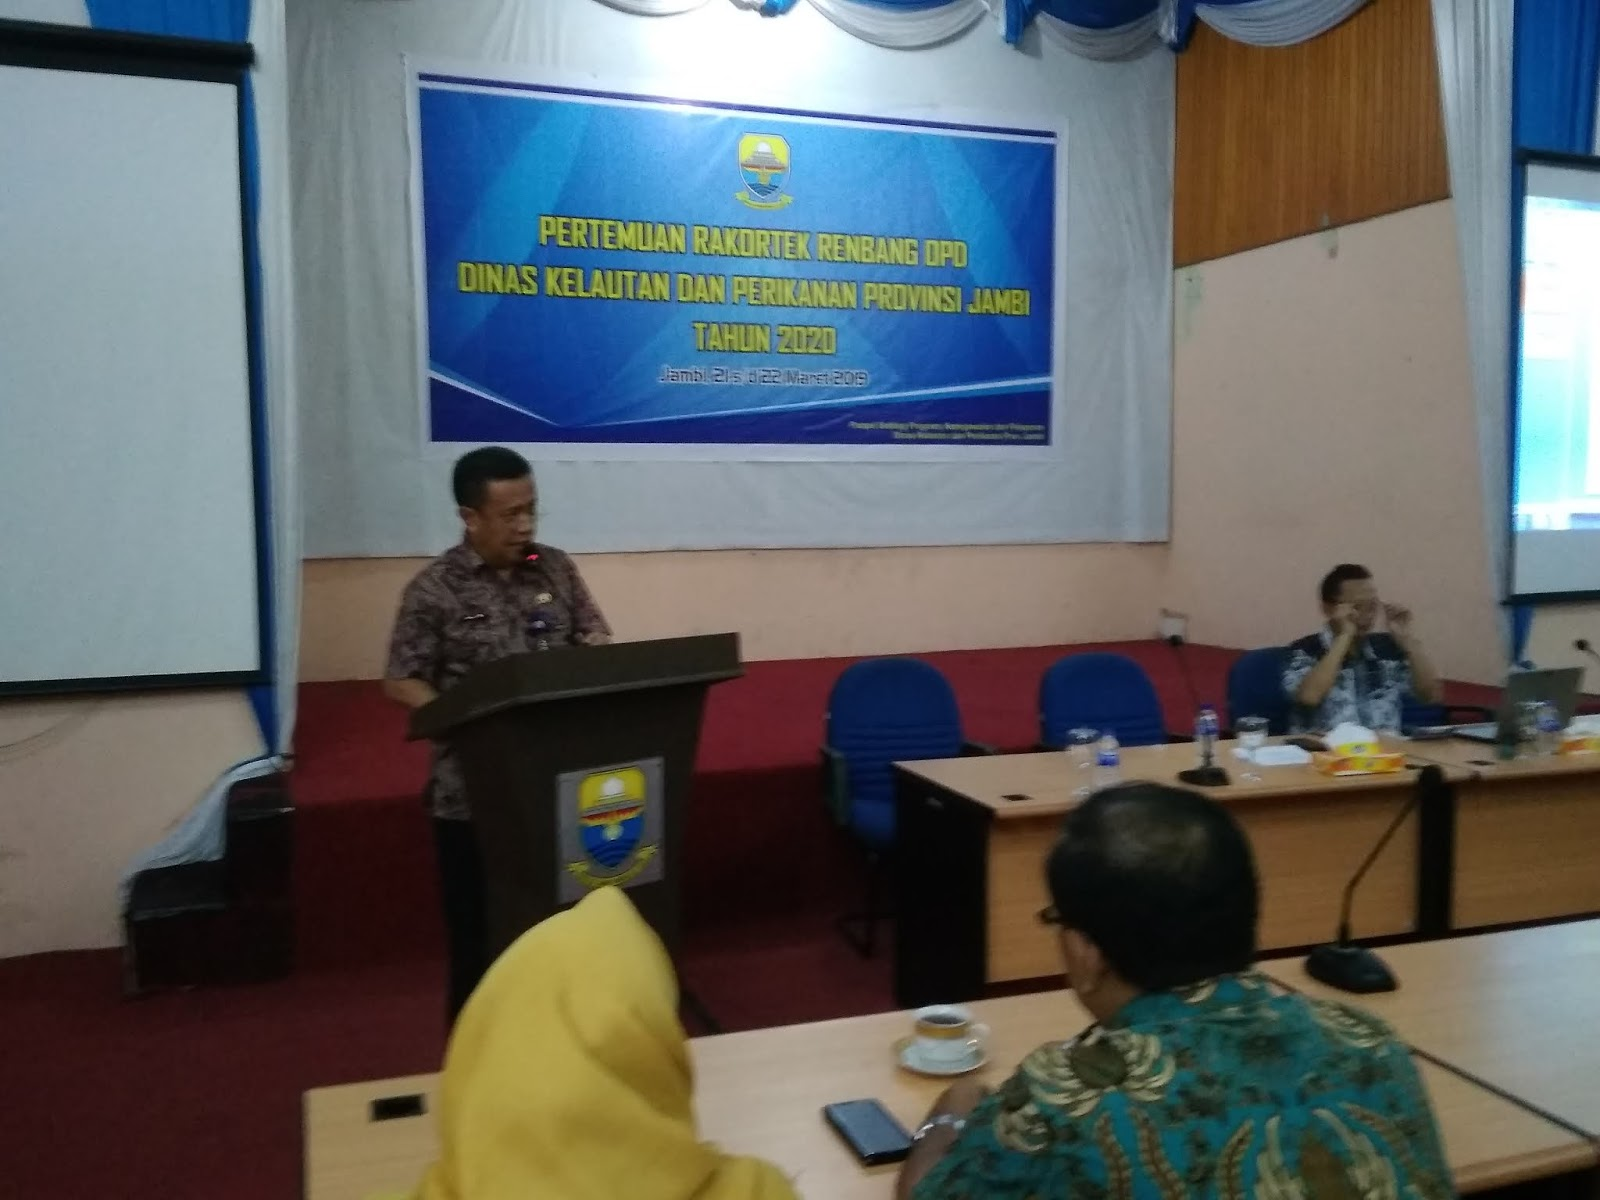 Kadis DKP Provinsi Jambi Membuka Secara Resmi Rakortek Renbang